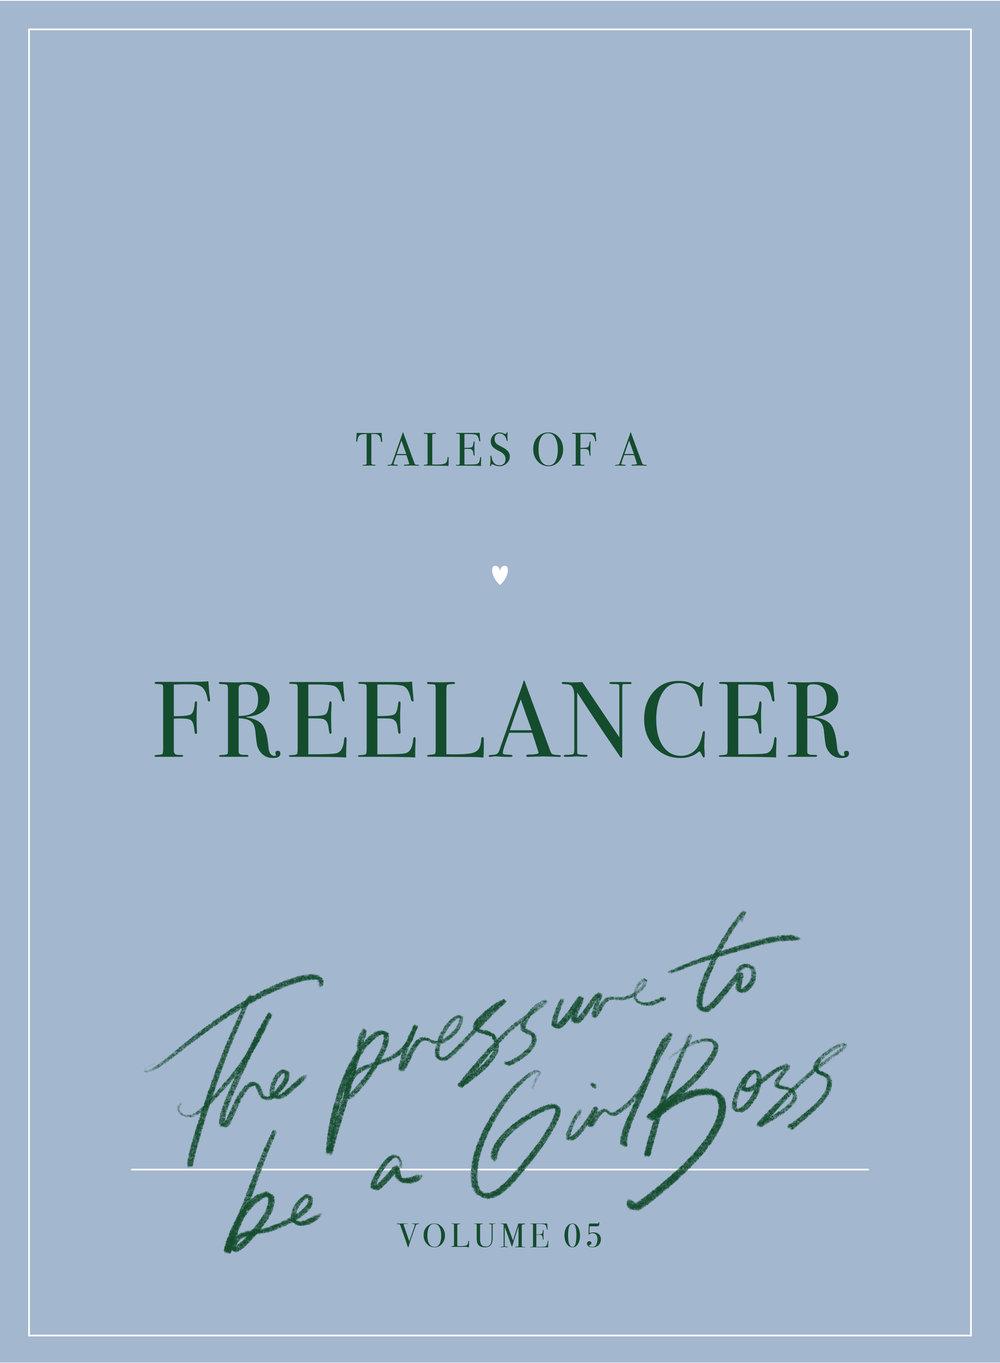 TalesOfAFreelancer_GirlBossPressure.jpg